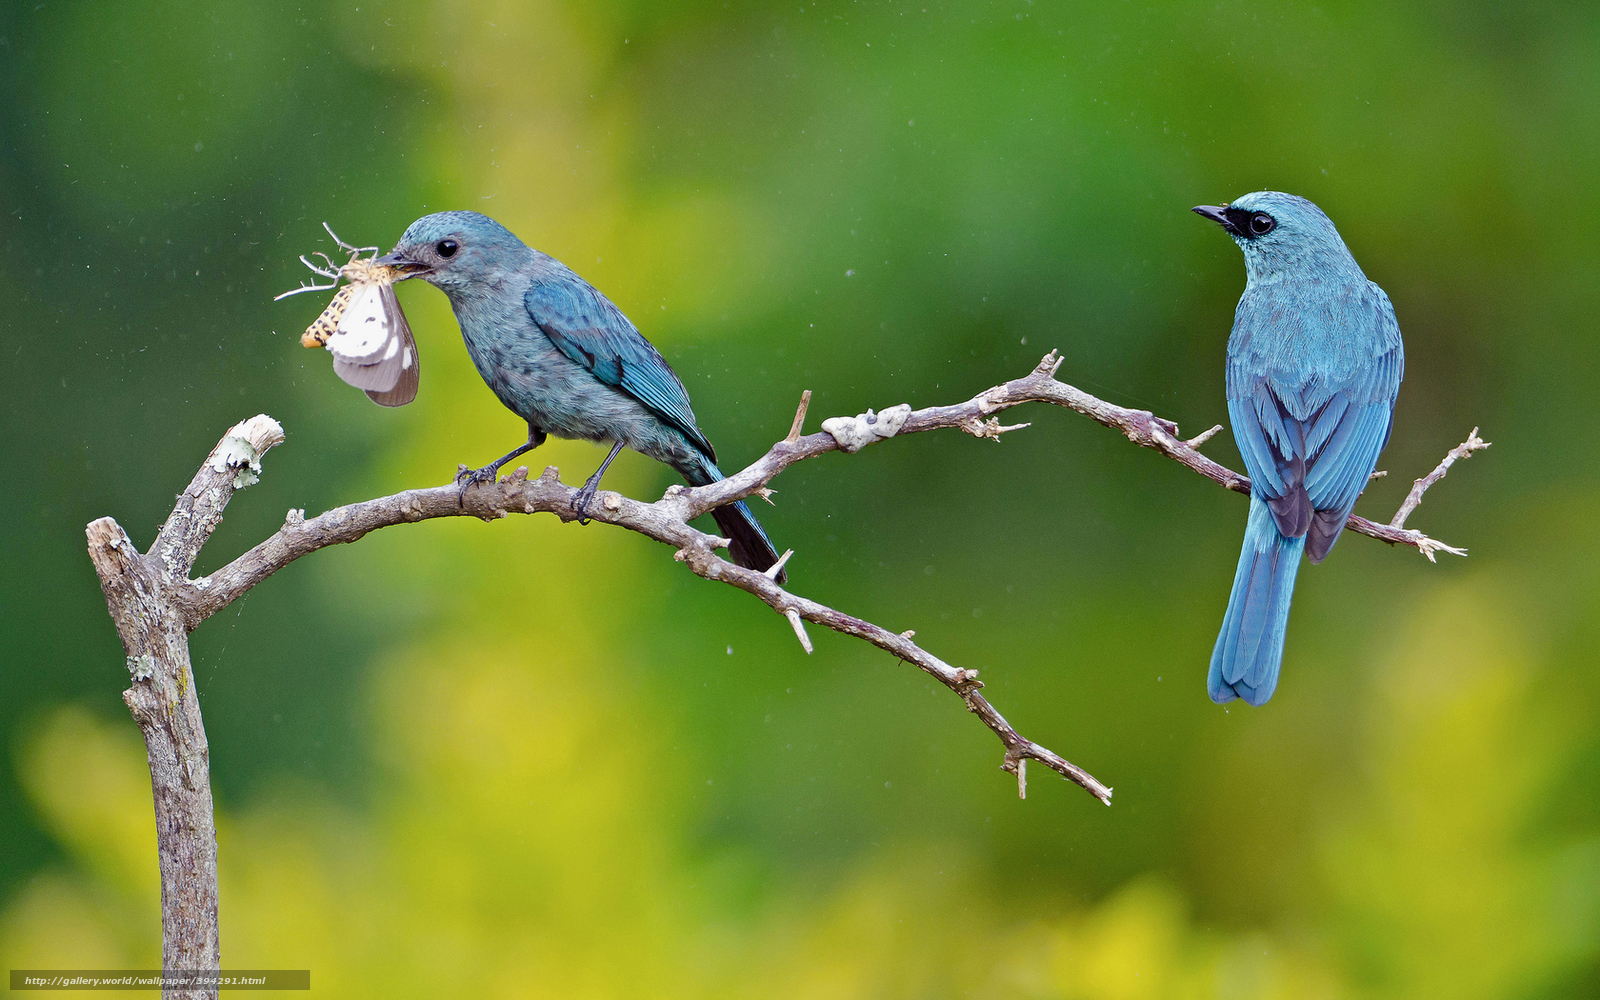 Download wallpaper blue Birds catch butterfly desktop 1600x1000